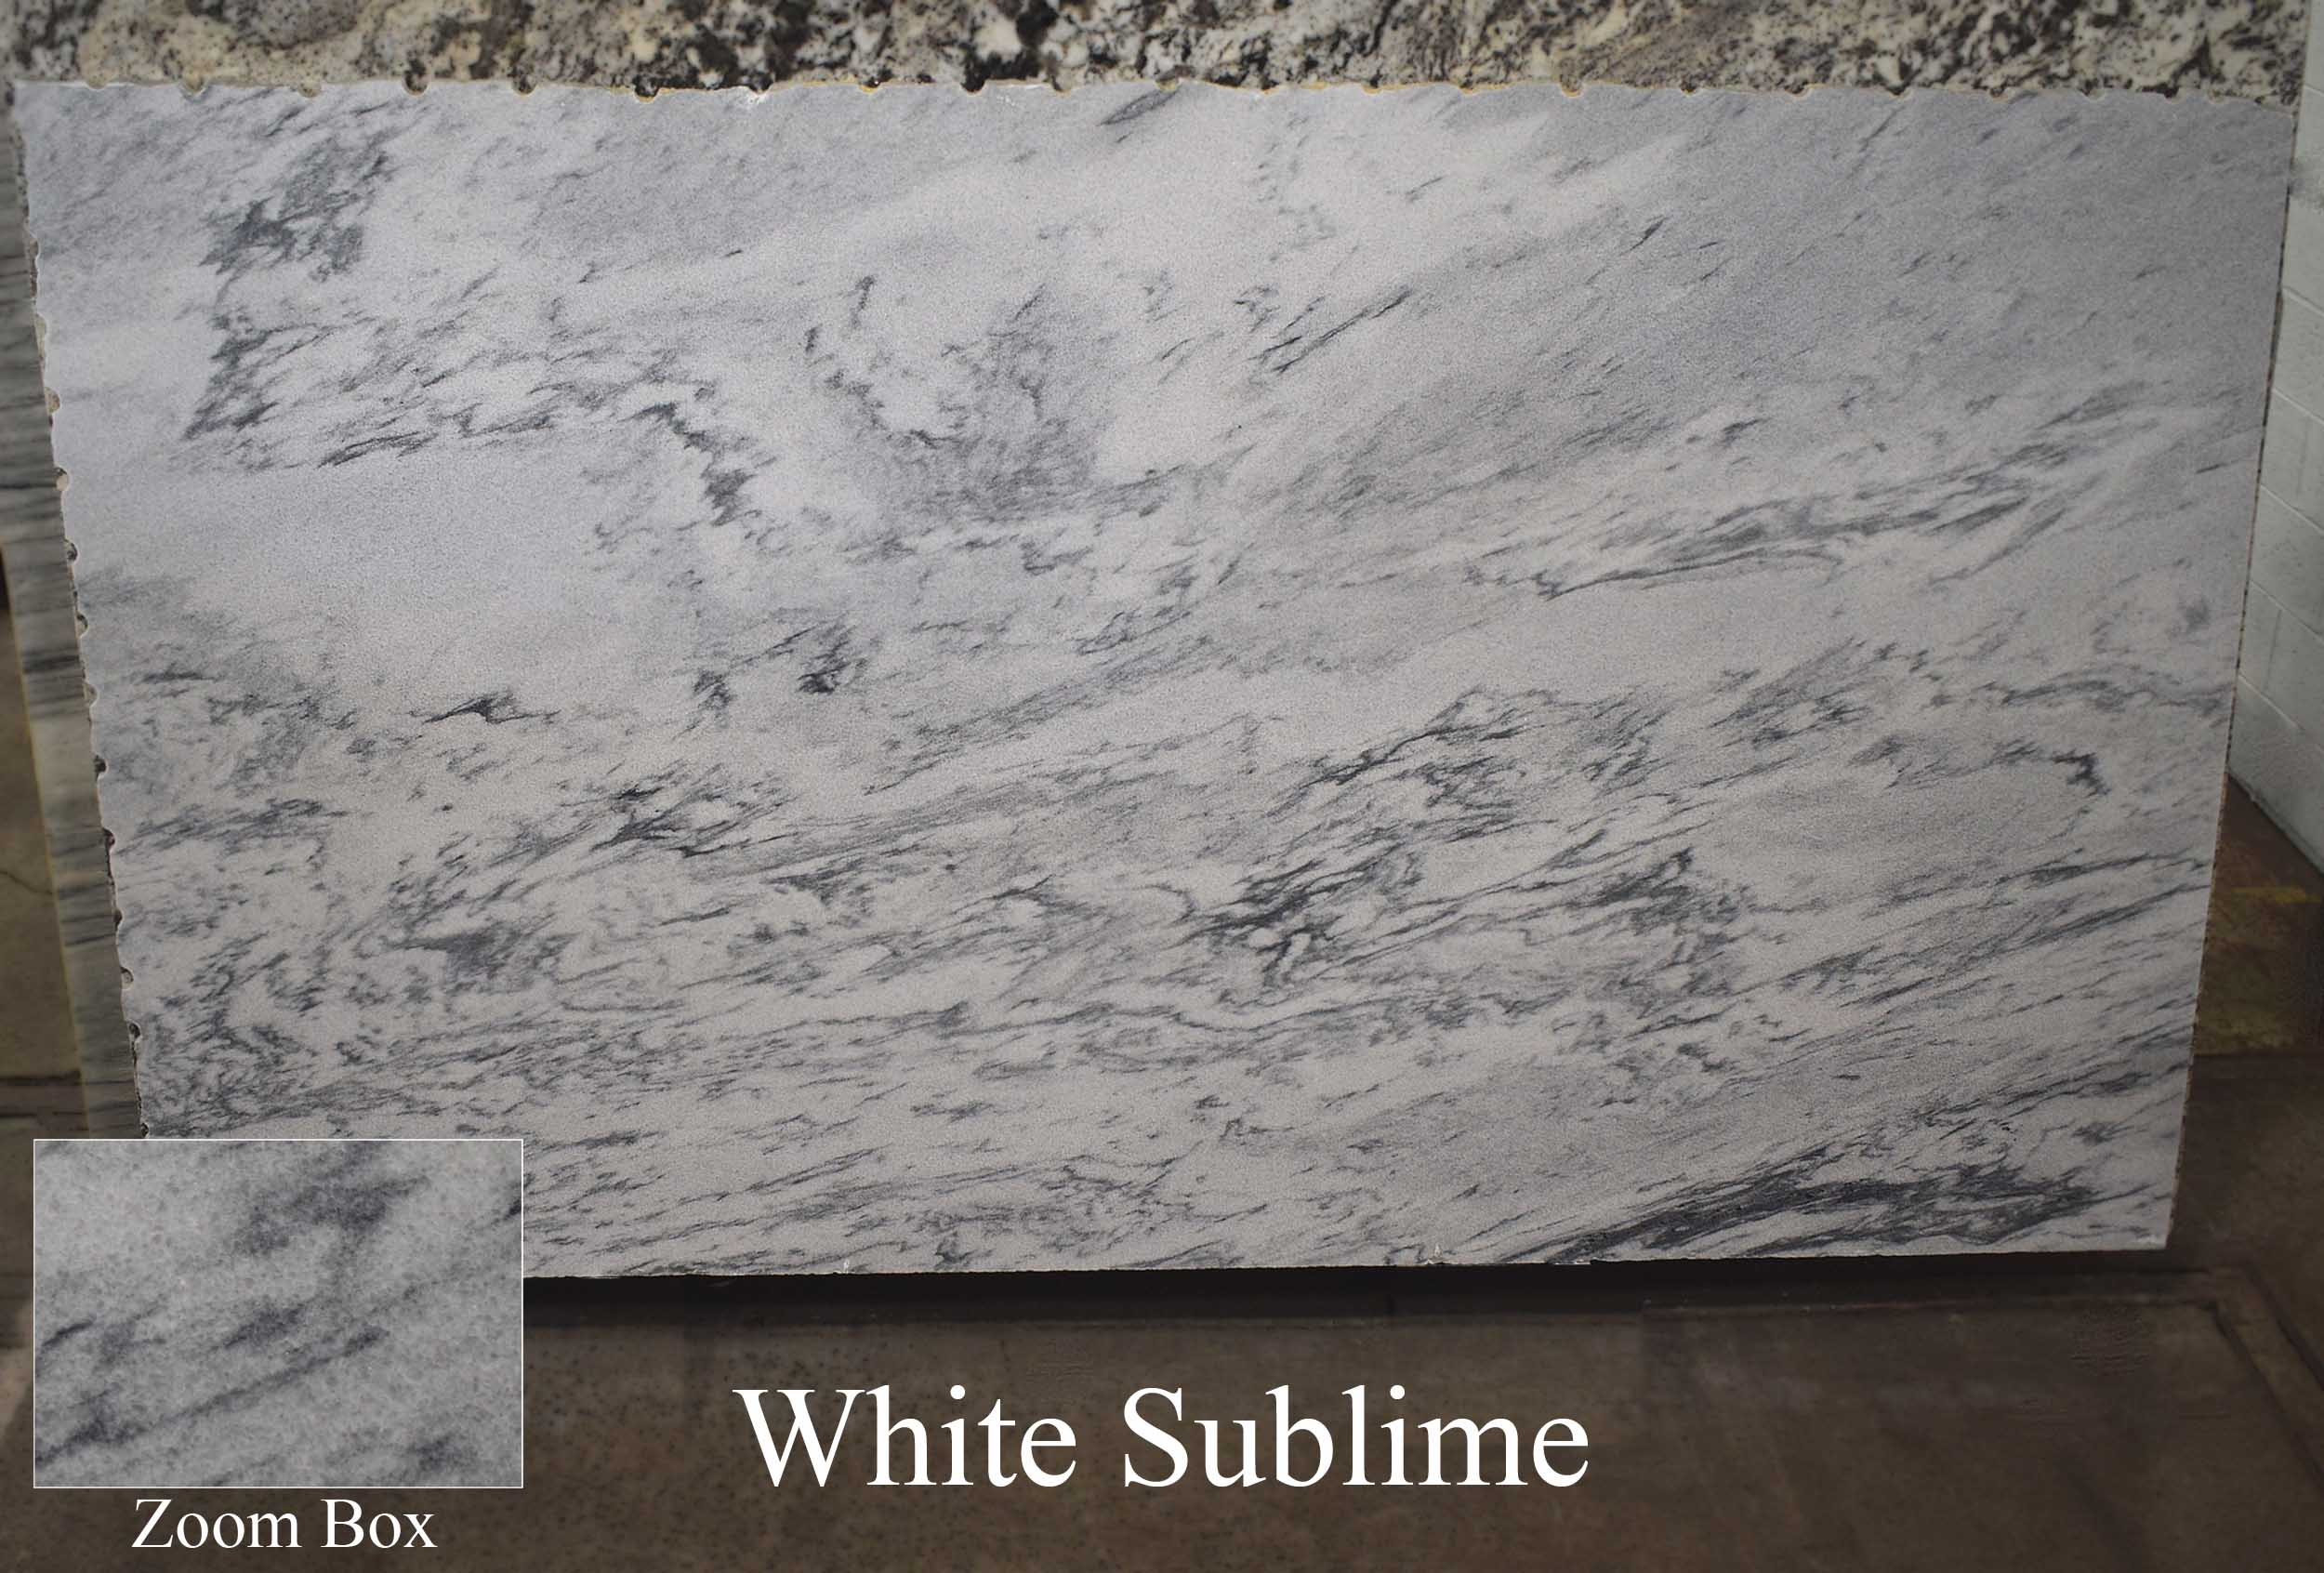 WHITE SUBLIME